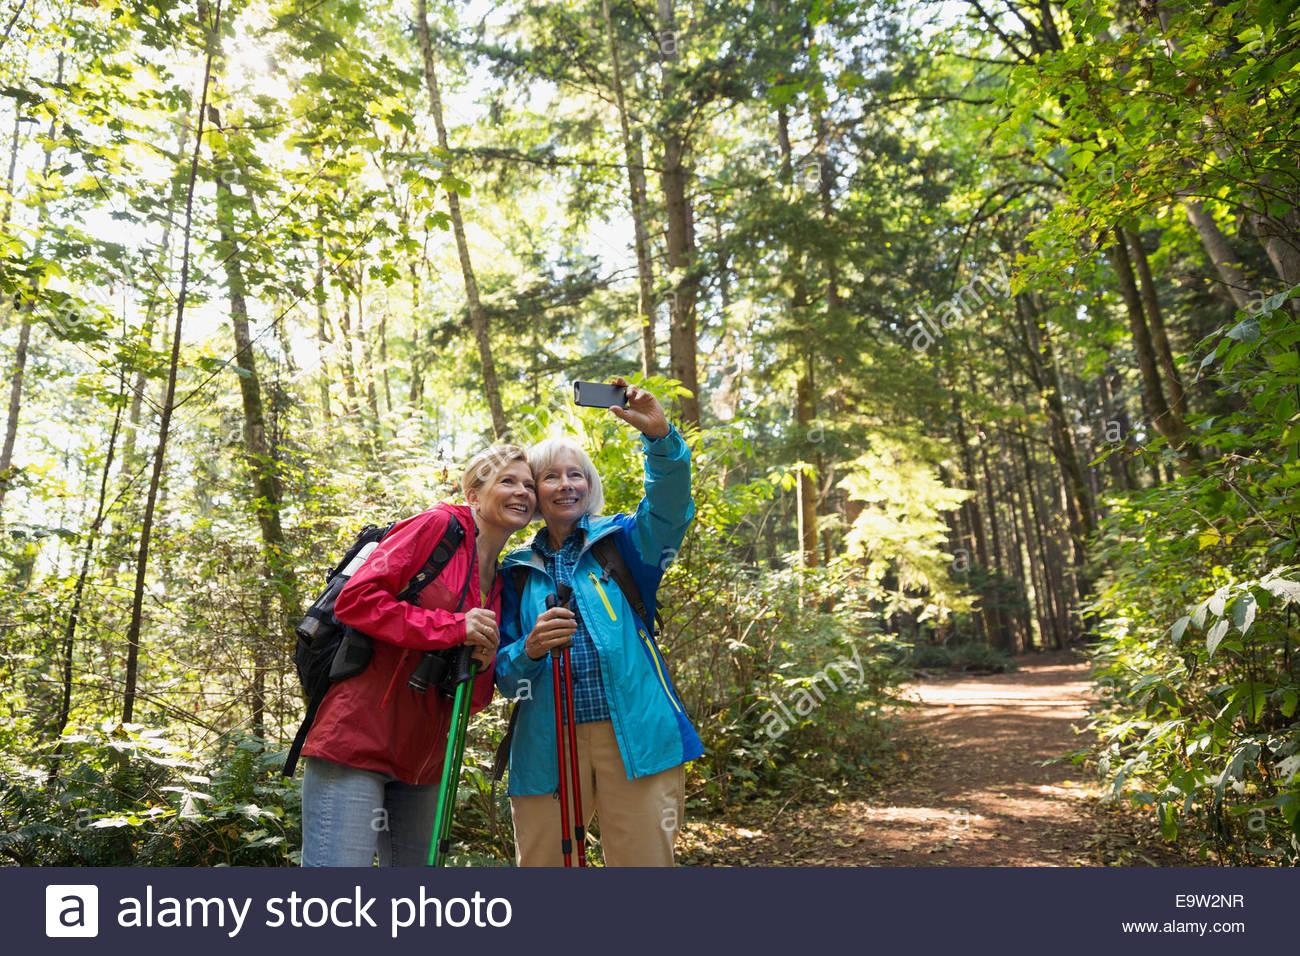 Women taking selfie on hiking trail in woods - Stock Image